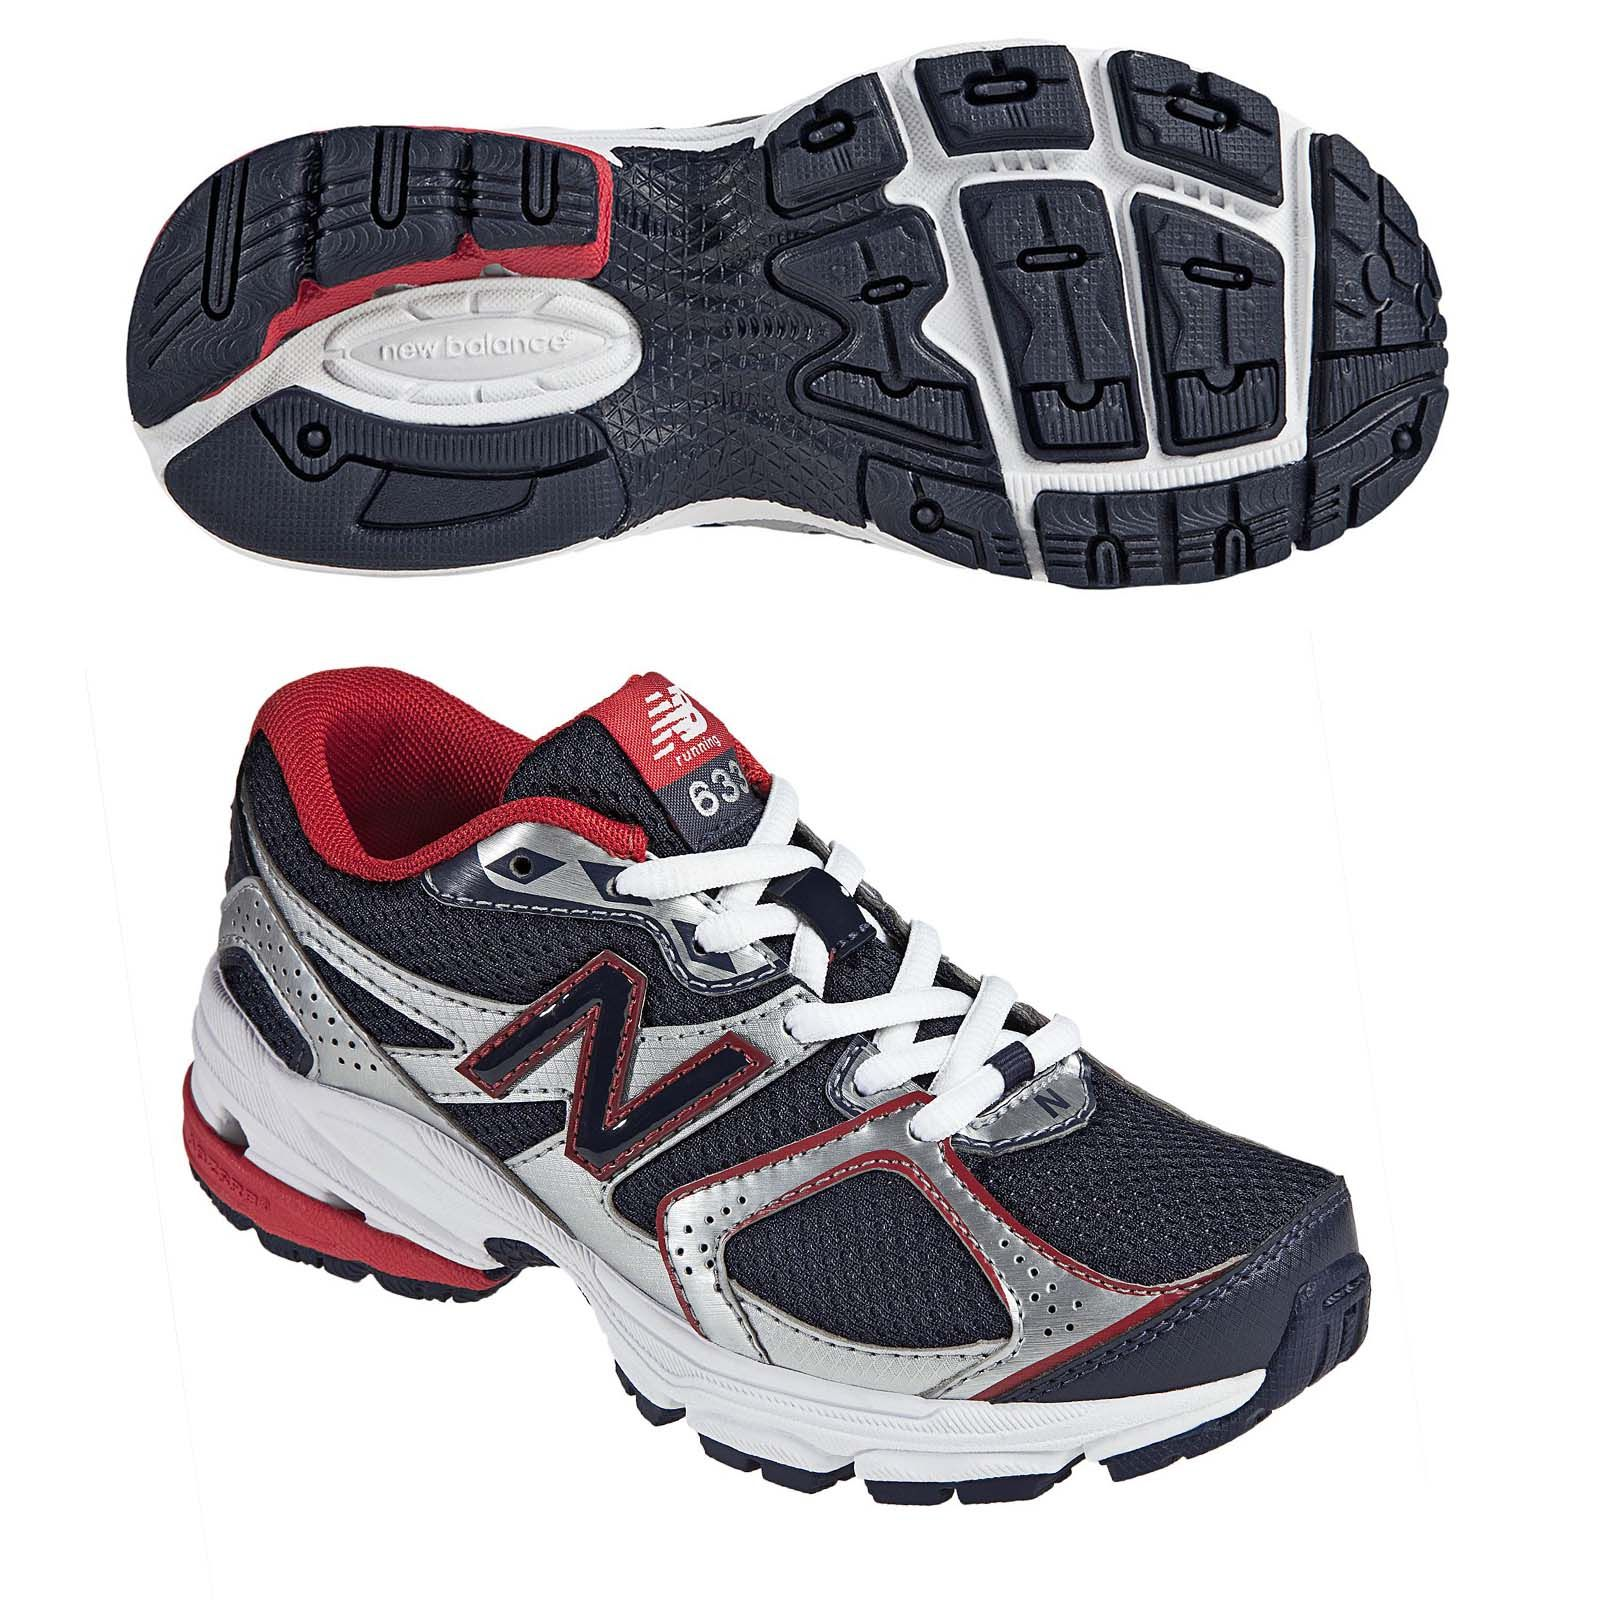 New Balance KJ633 Kids Running Shoes - Sweatband.com